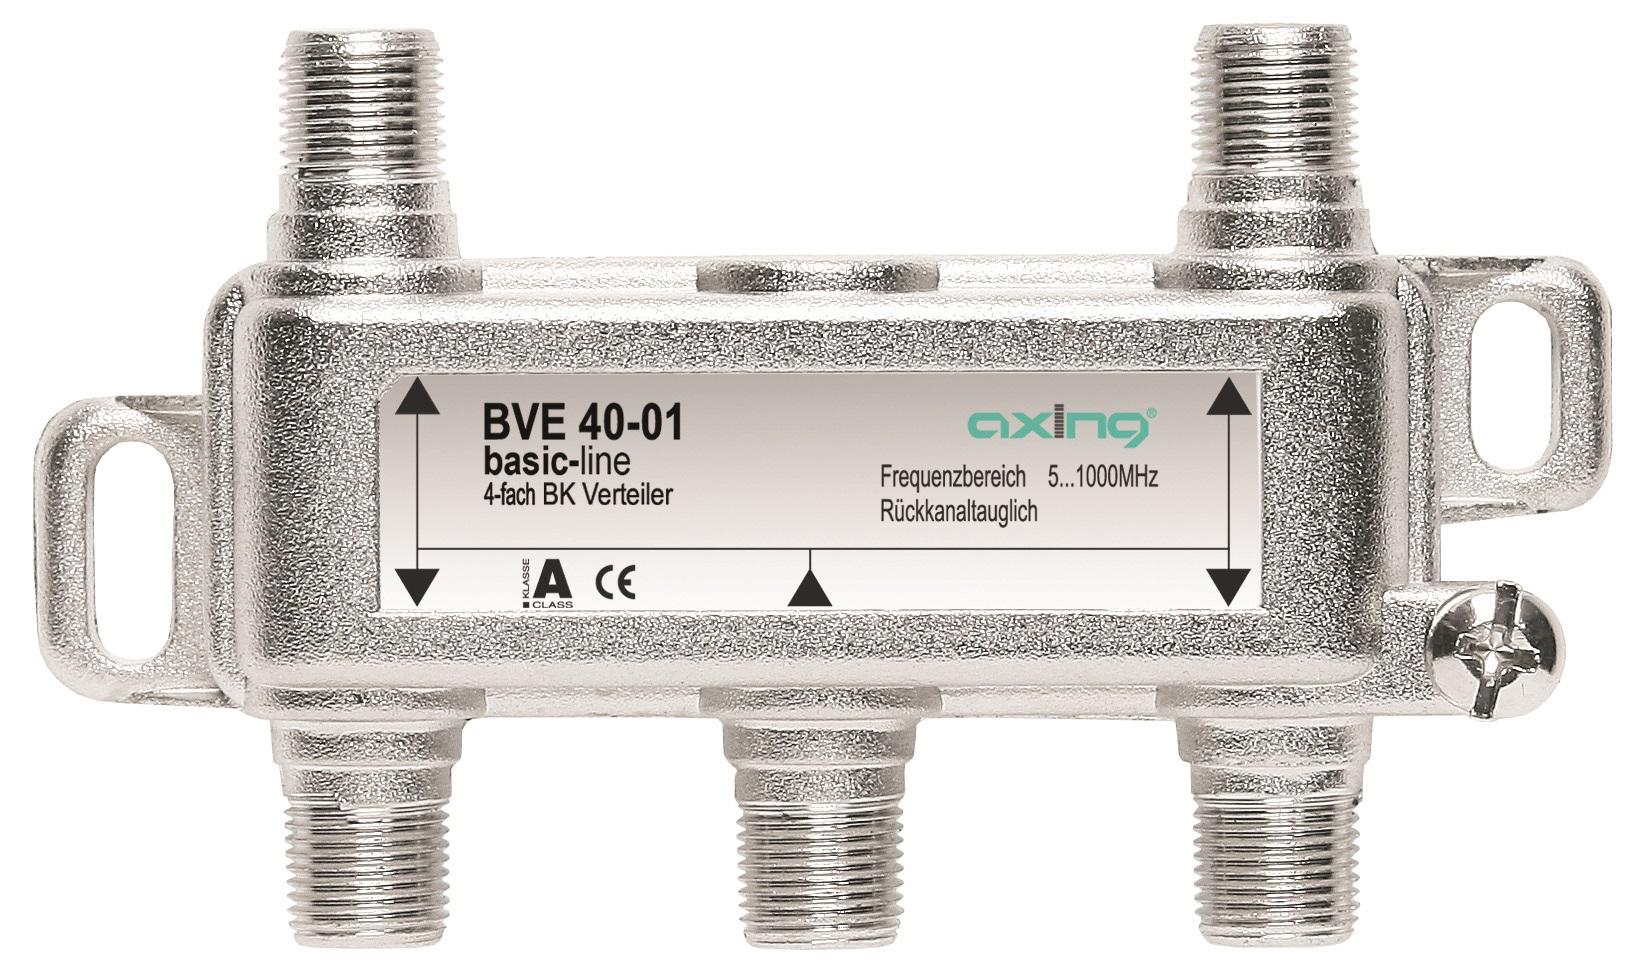 1 Stk BK Verteiler F-Buchse-4xF-Bu,Multimedia,5-1.006MHz,BVE 40-01 HSZUVM4F--